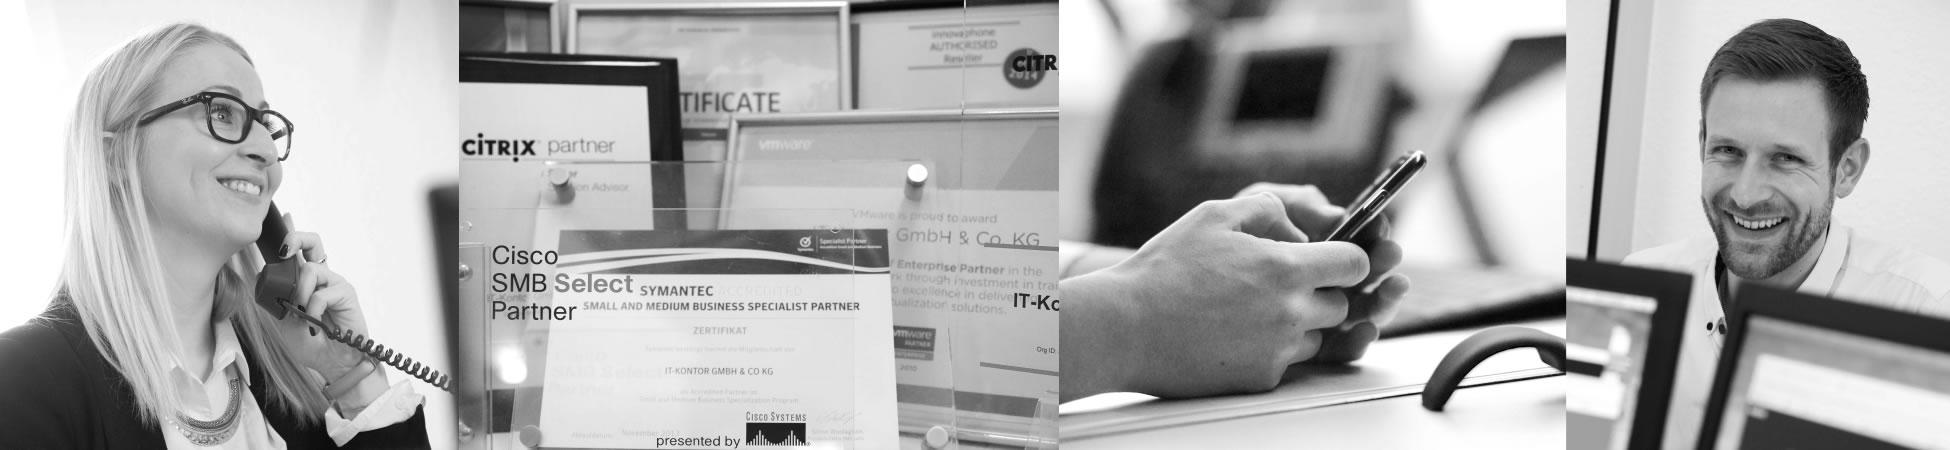 C.C.Christiansen GmbH & Co. KG